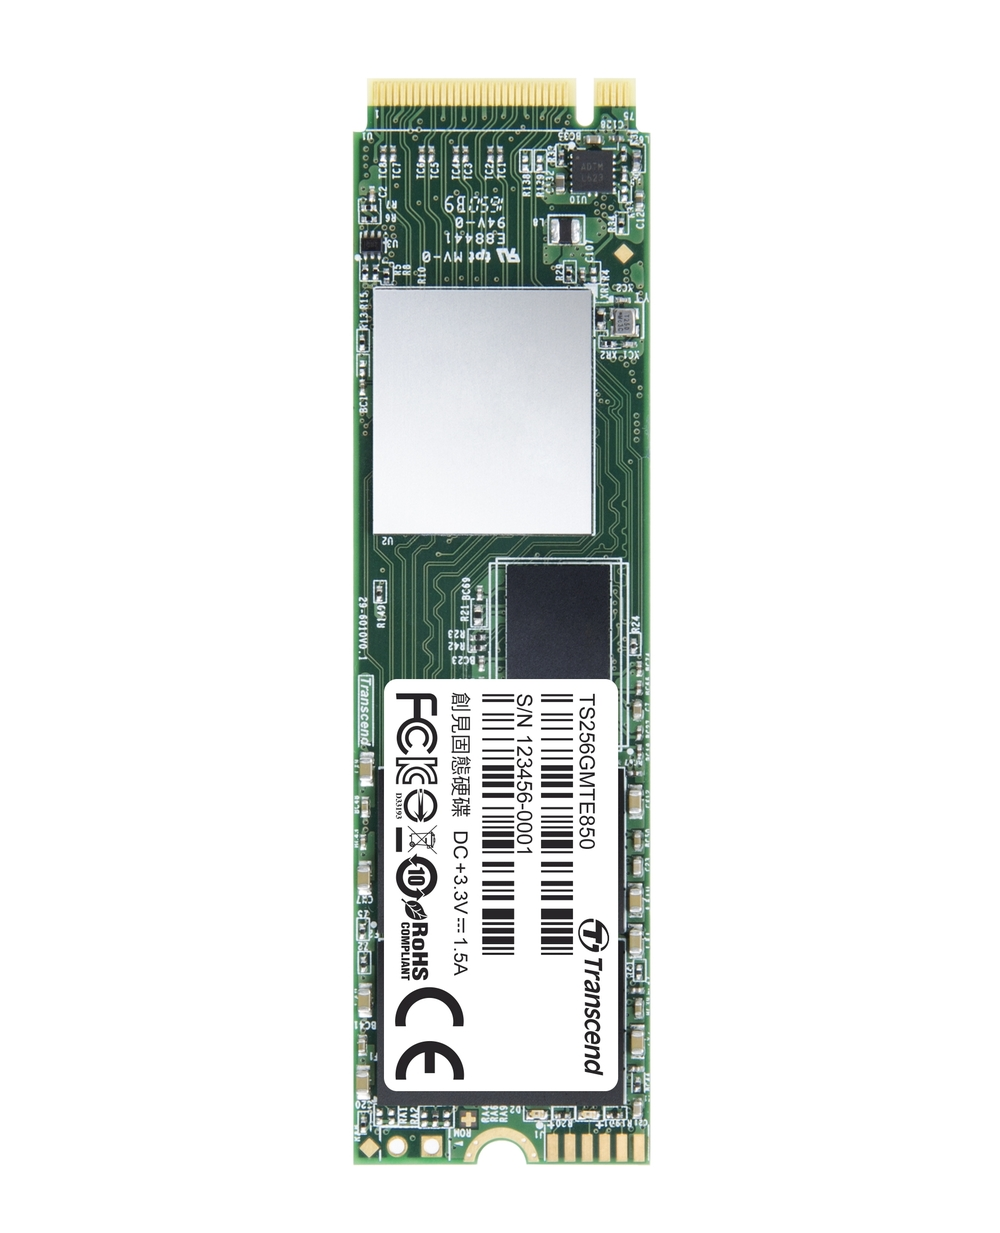 TRANSCEND MTE850 256GB SSD disk M.2 2280, PCIe Gen3 x4 NVMe 1.2 (3D MLC)